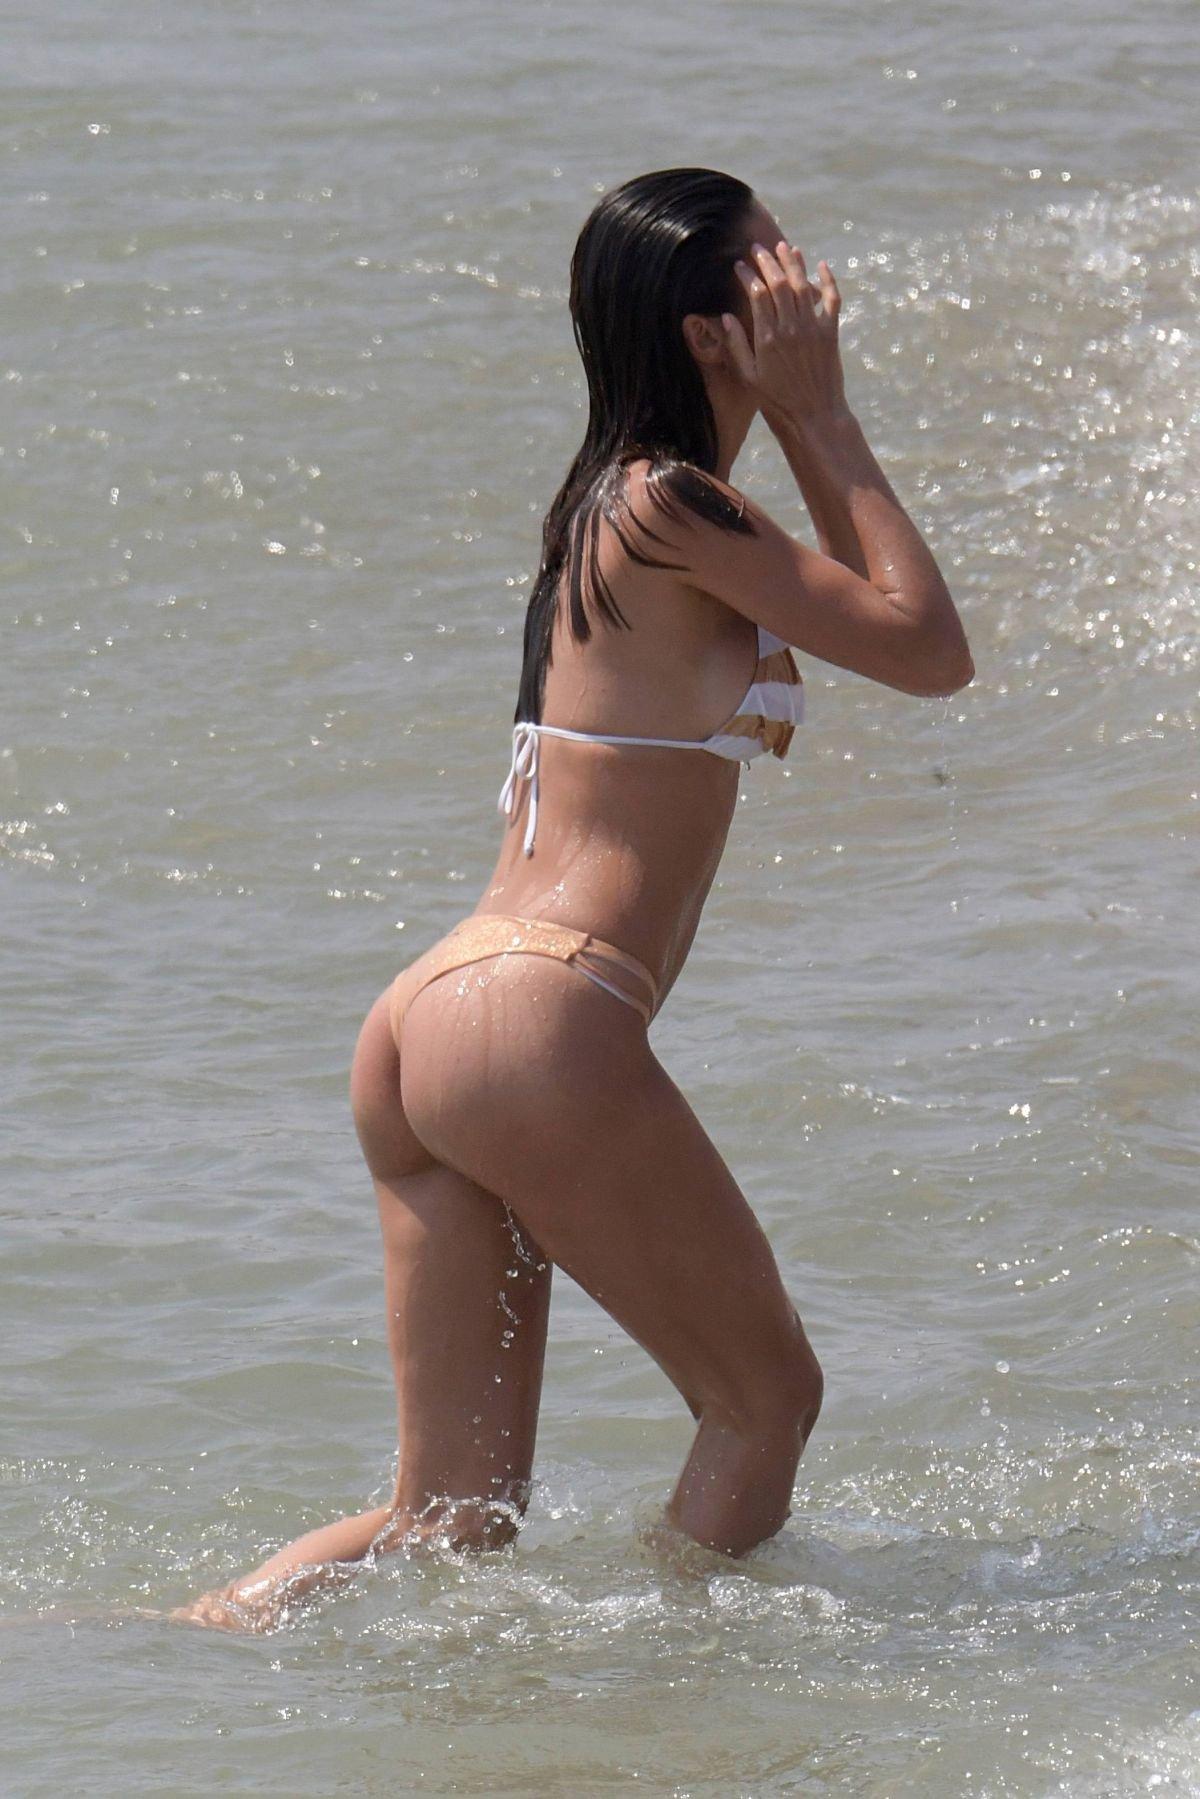 Fuck Federica Nargi nude (64 photo), Ass, Sideboobs, Boobs, butt 2006